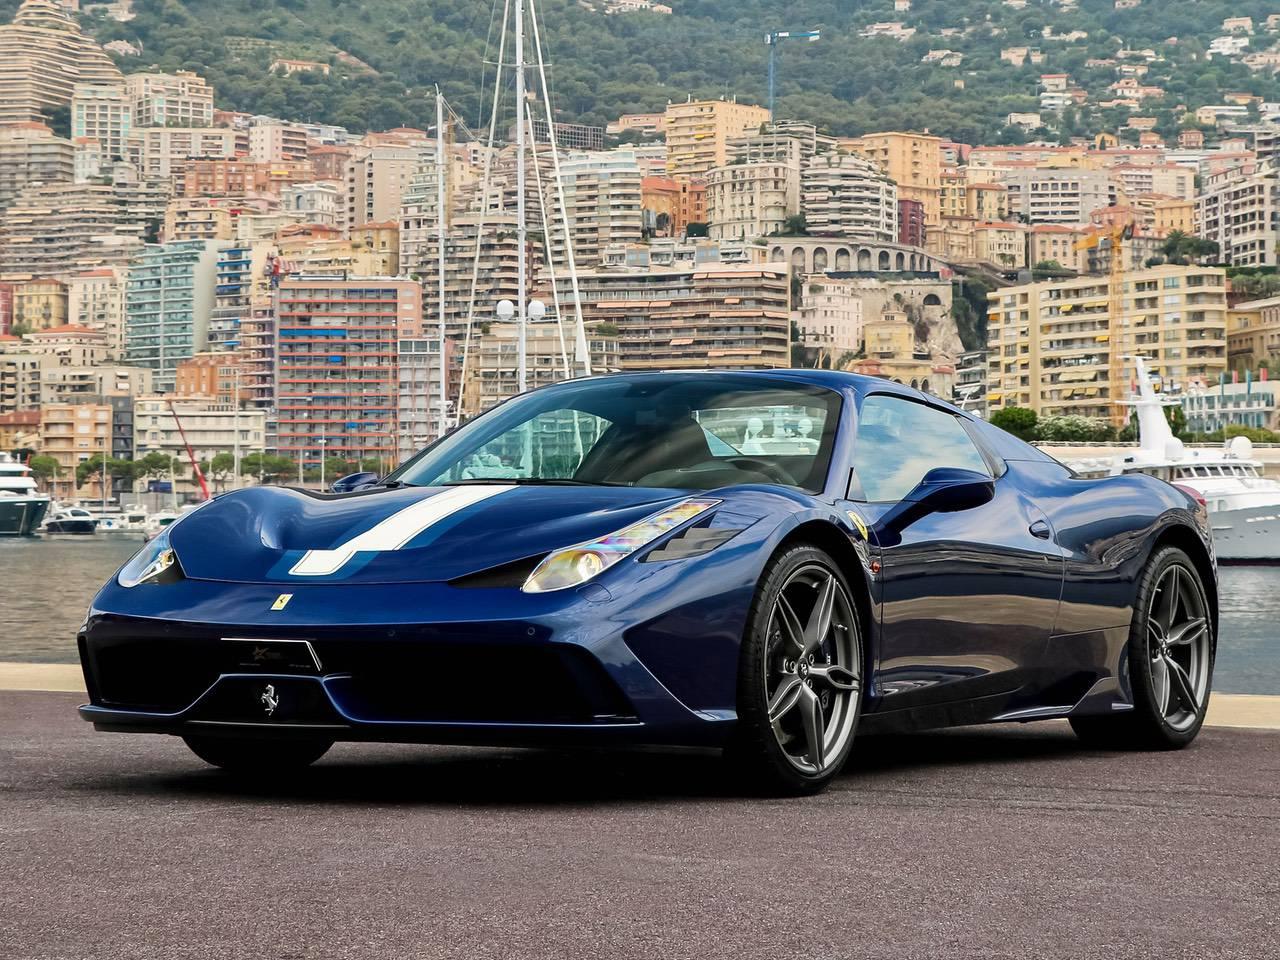 Ferrari-458-Speciale-Spider-A-2